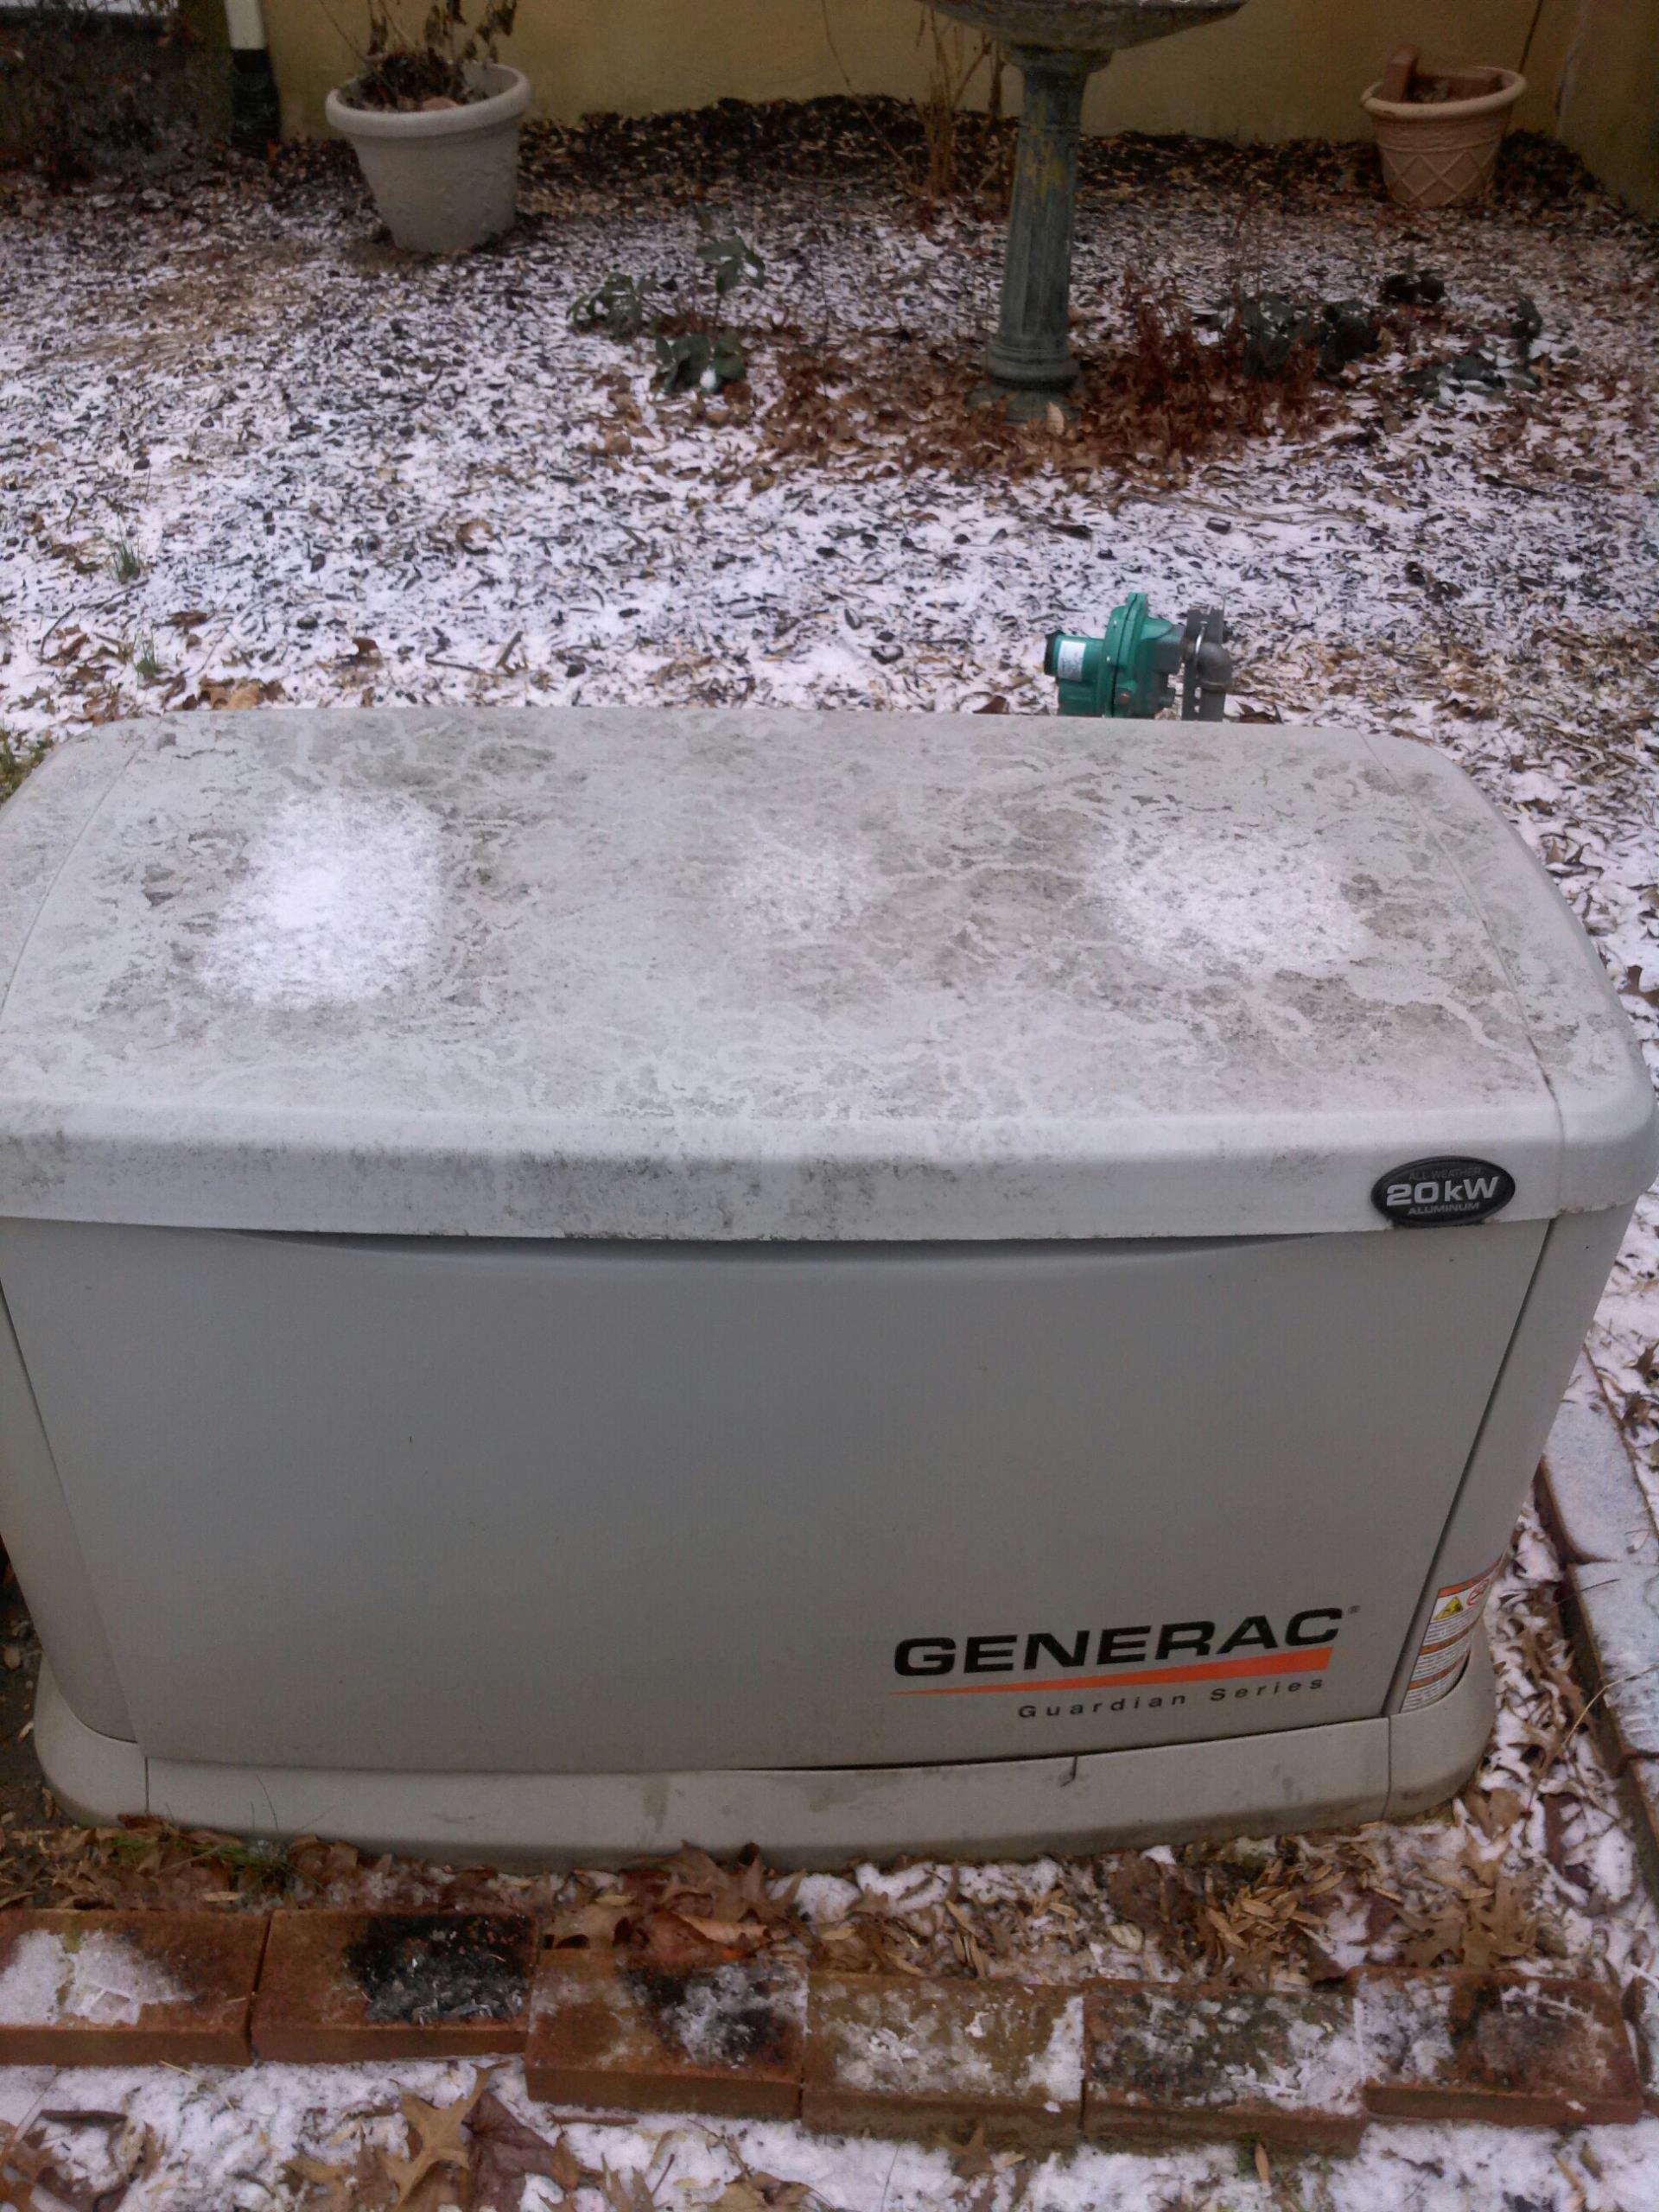 Gambrills, MD - 20 KW Generac standby generator installation repair service call in Gambrills Maryland 21054